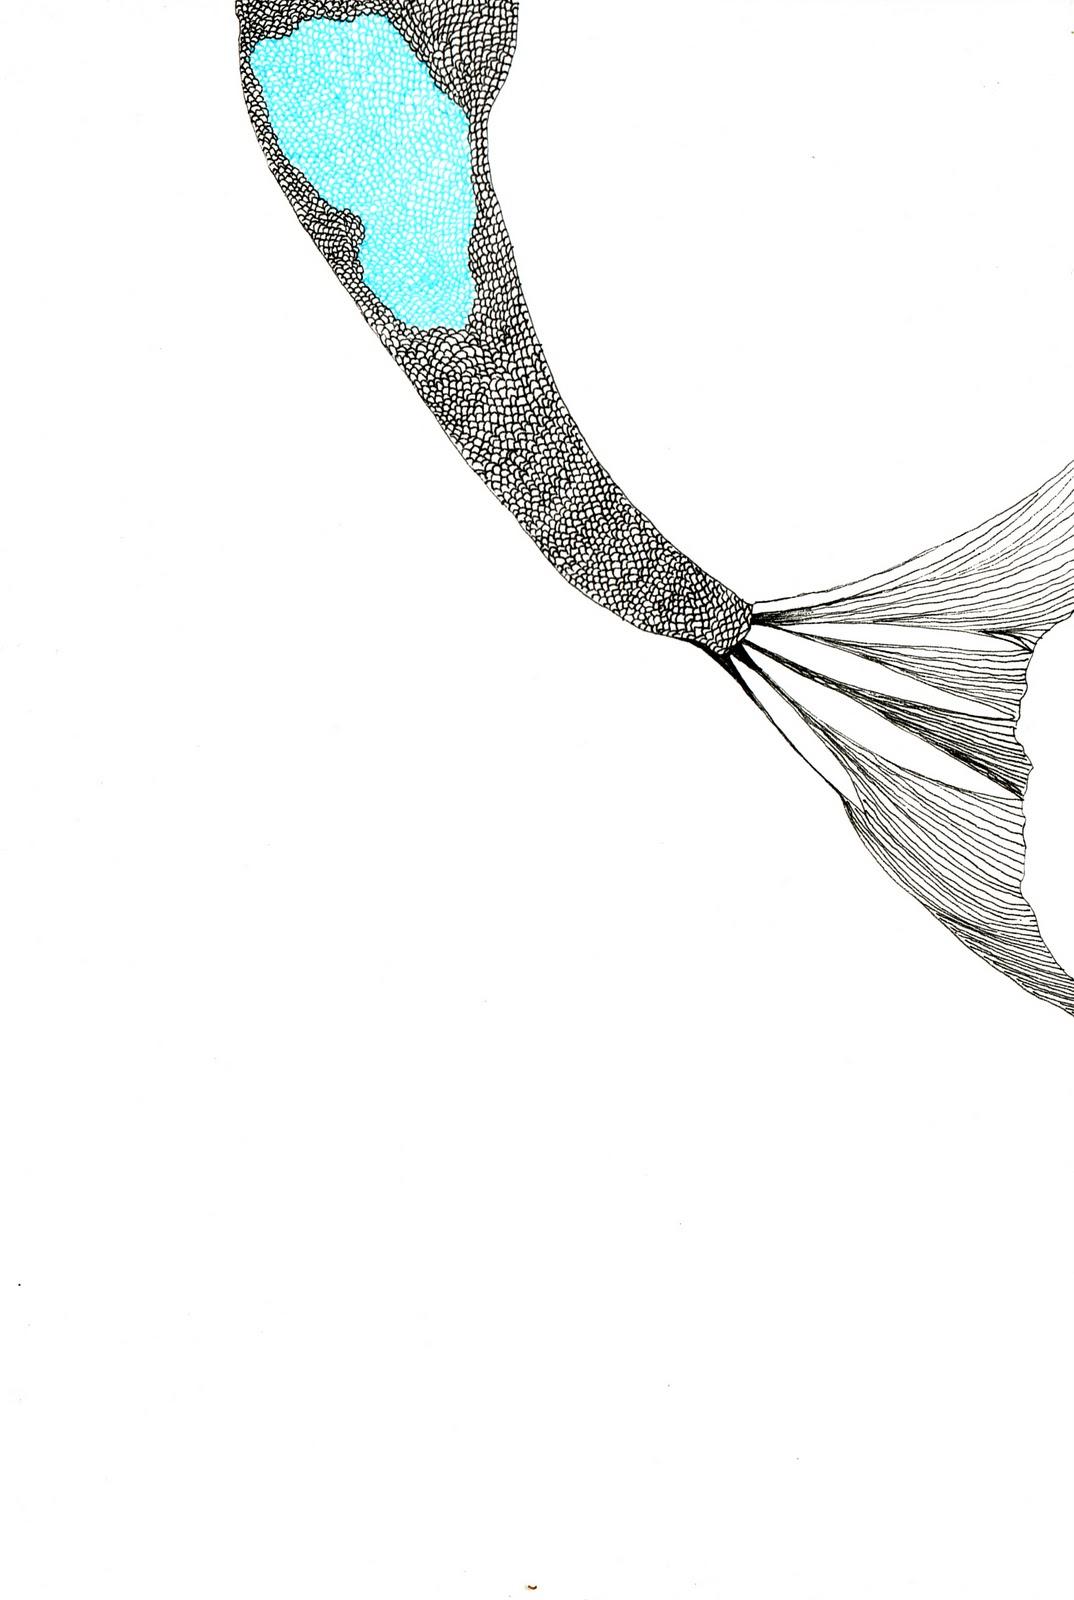 Gabriela-Sanchez-Drawing13.jpg